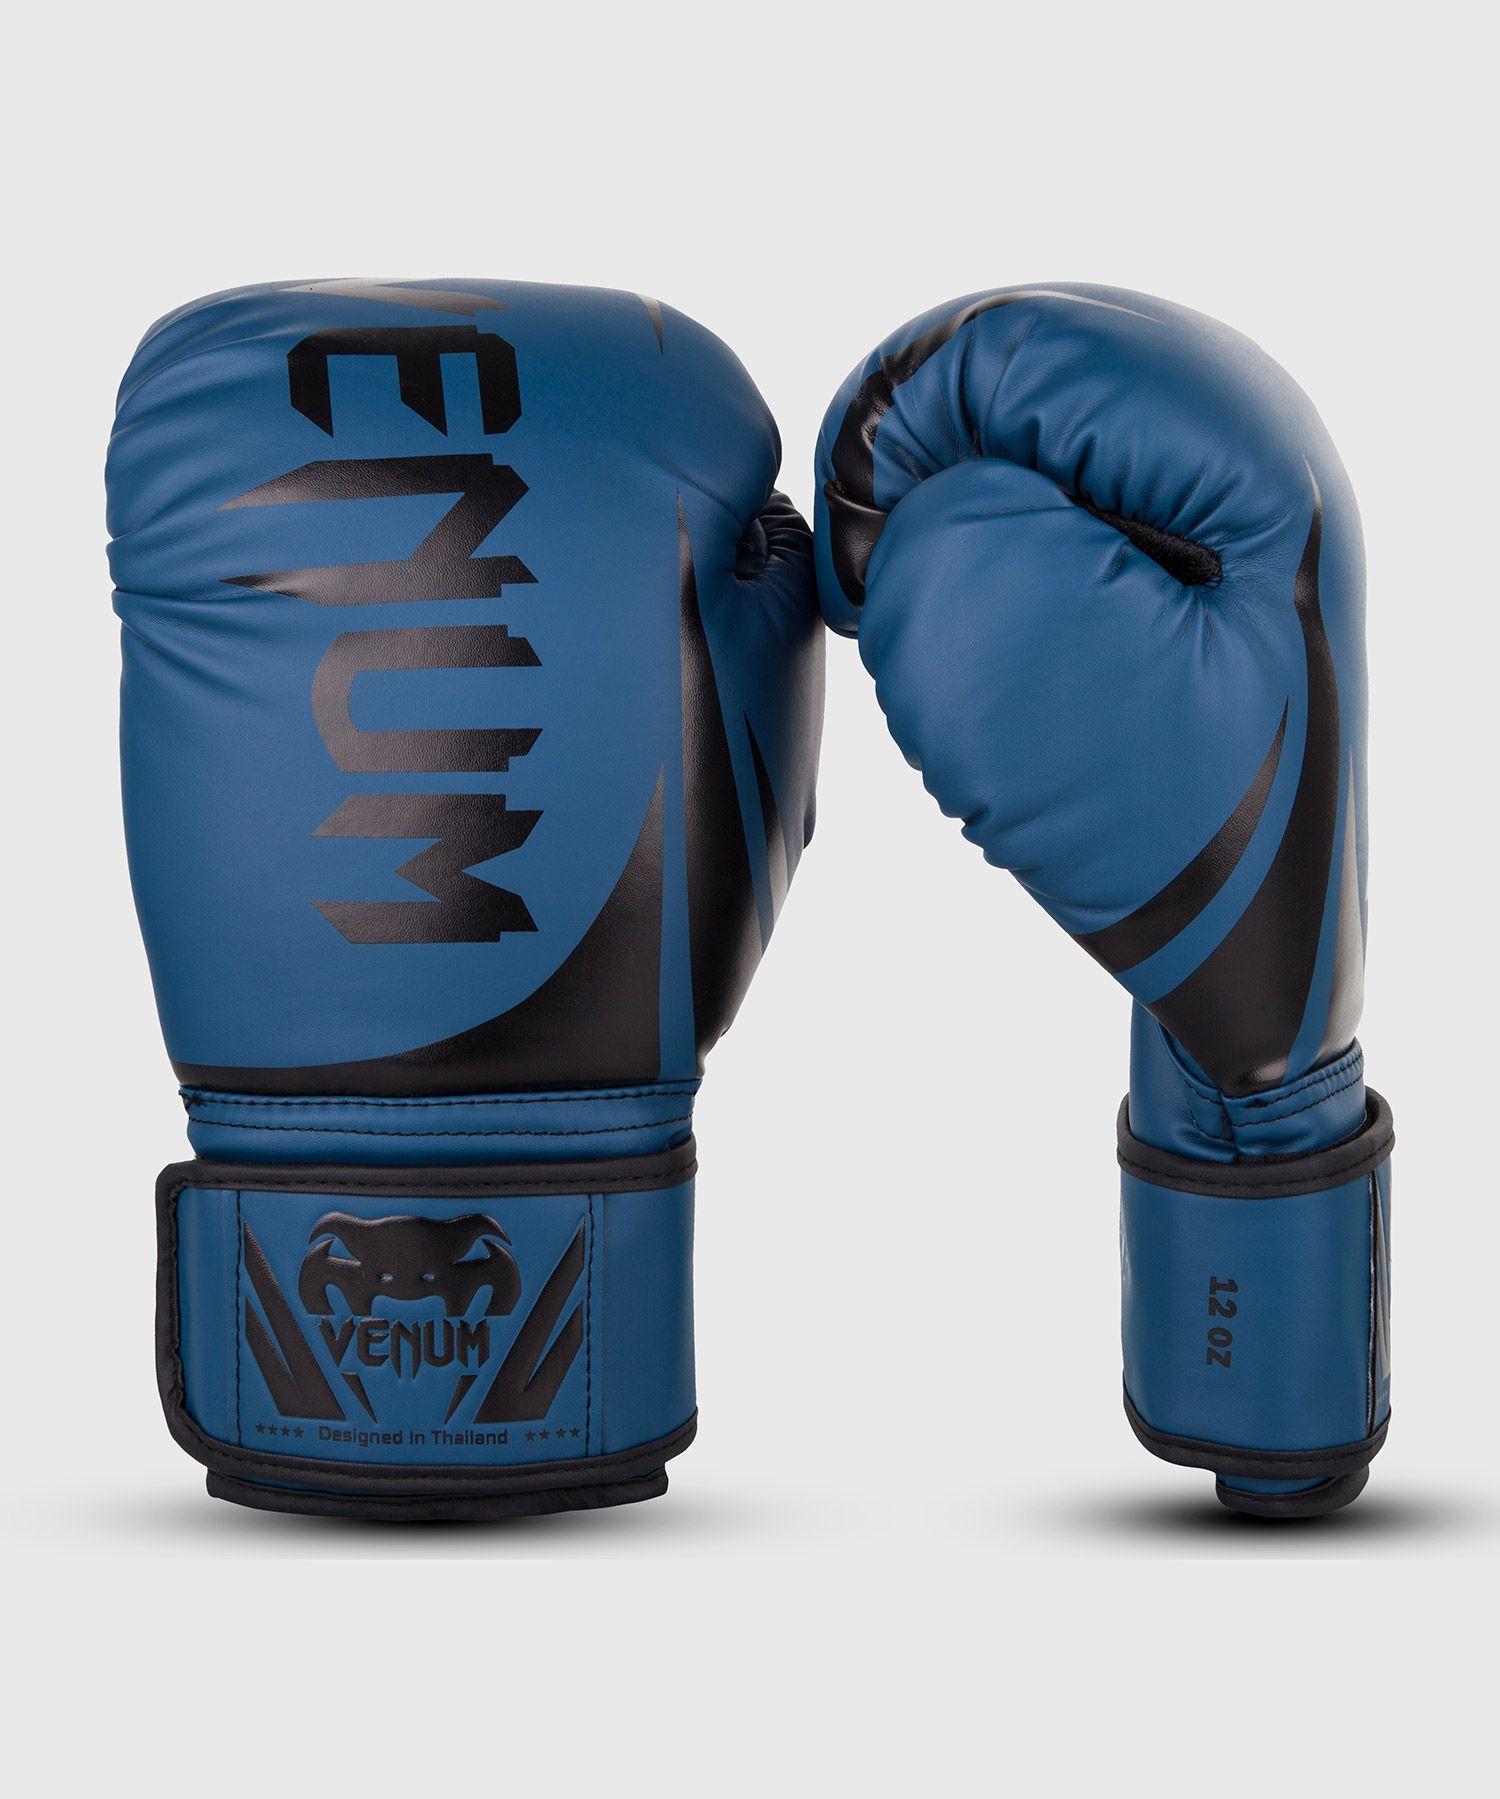 Venum Challenger 2.0 Boxing Gloves - Navy blue/Black